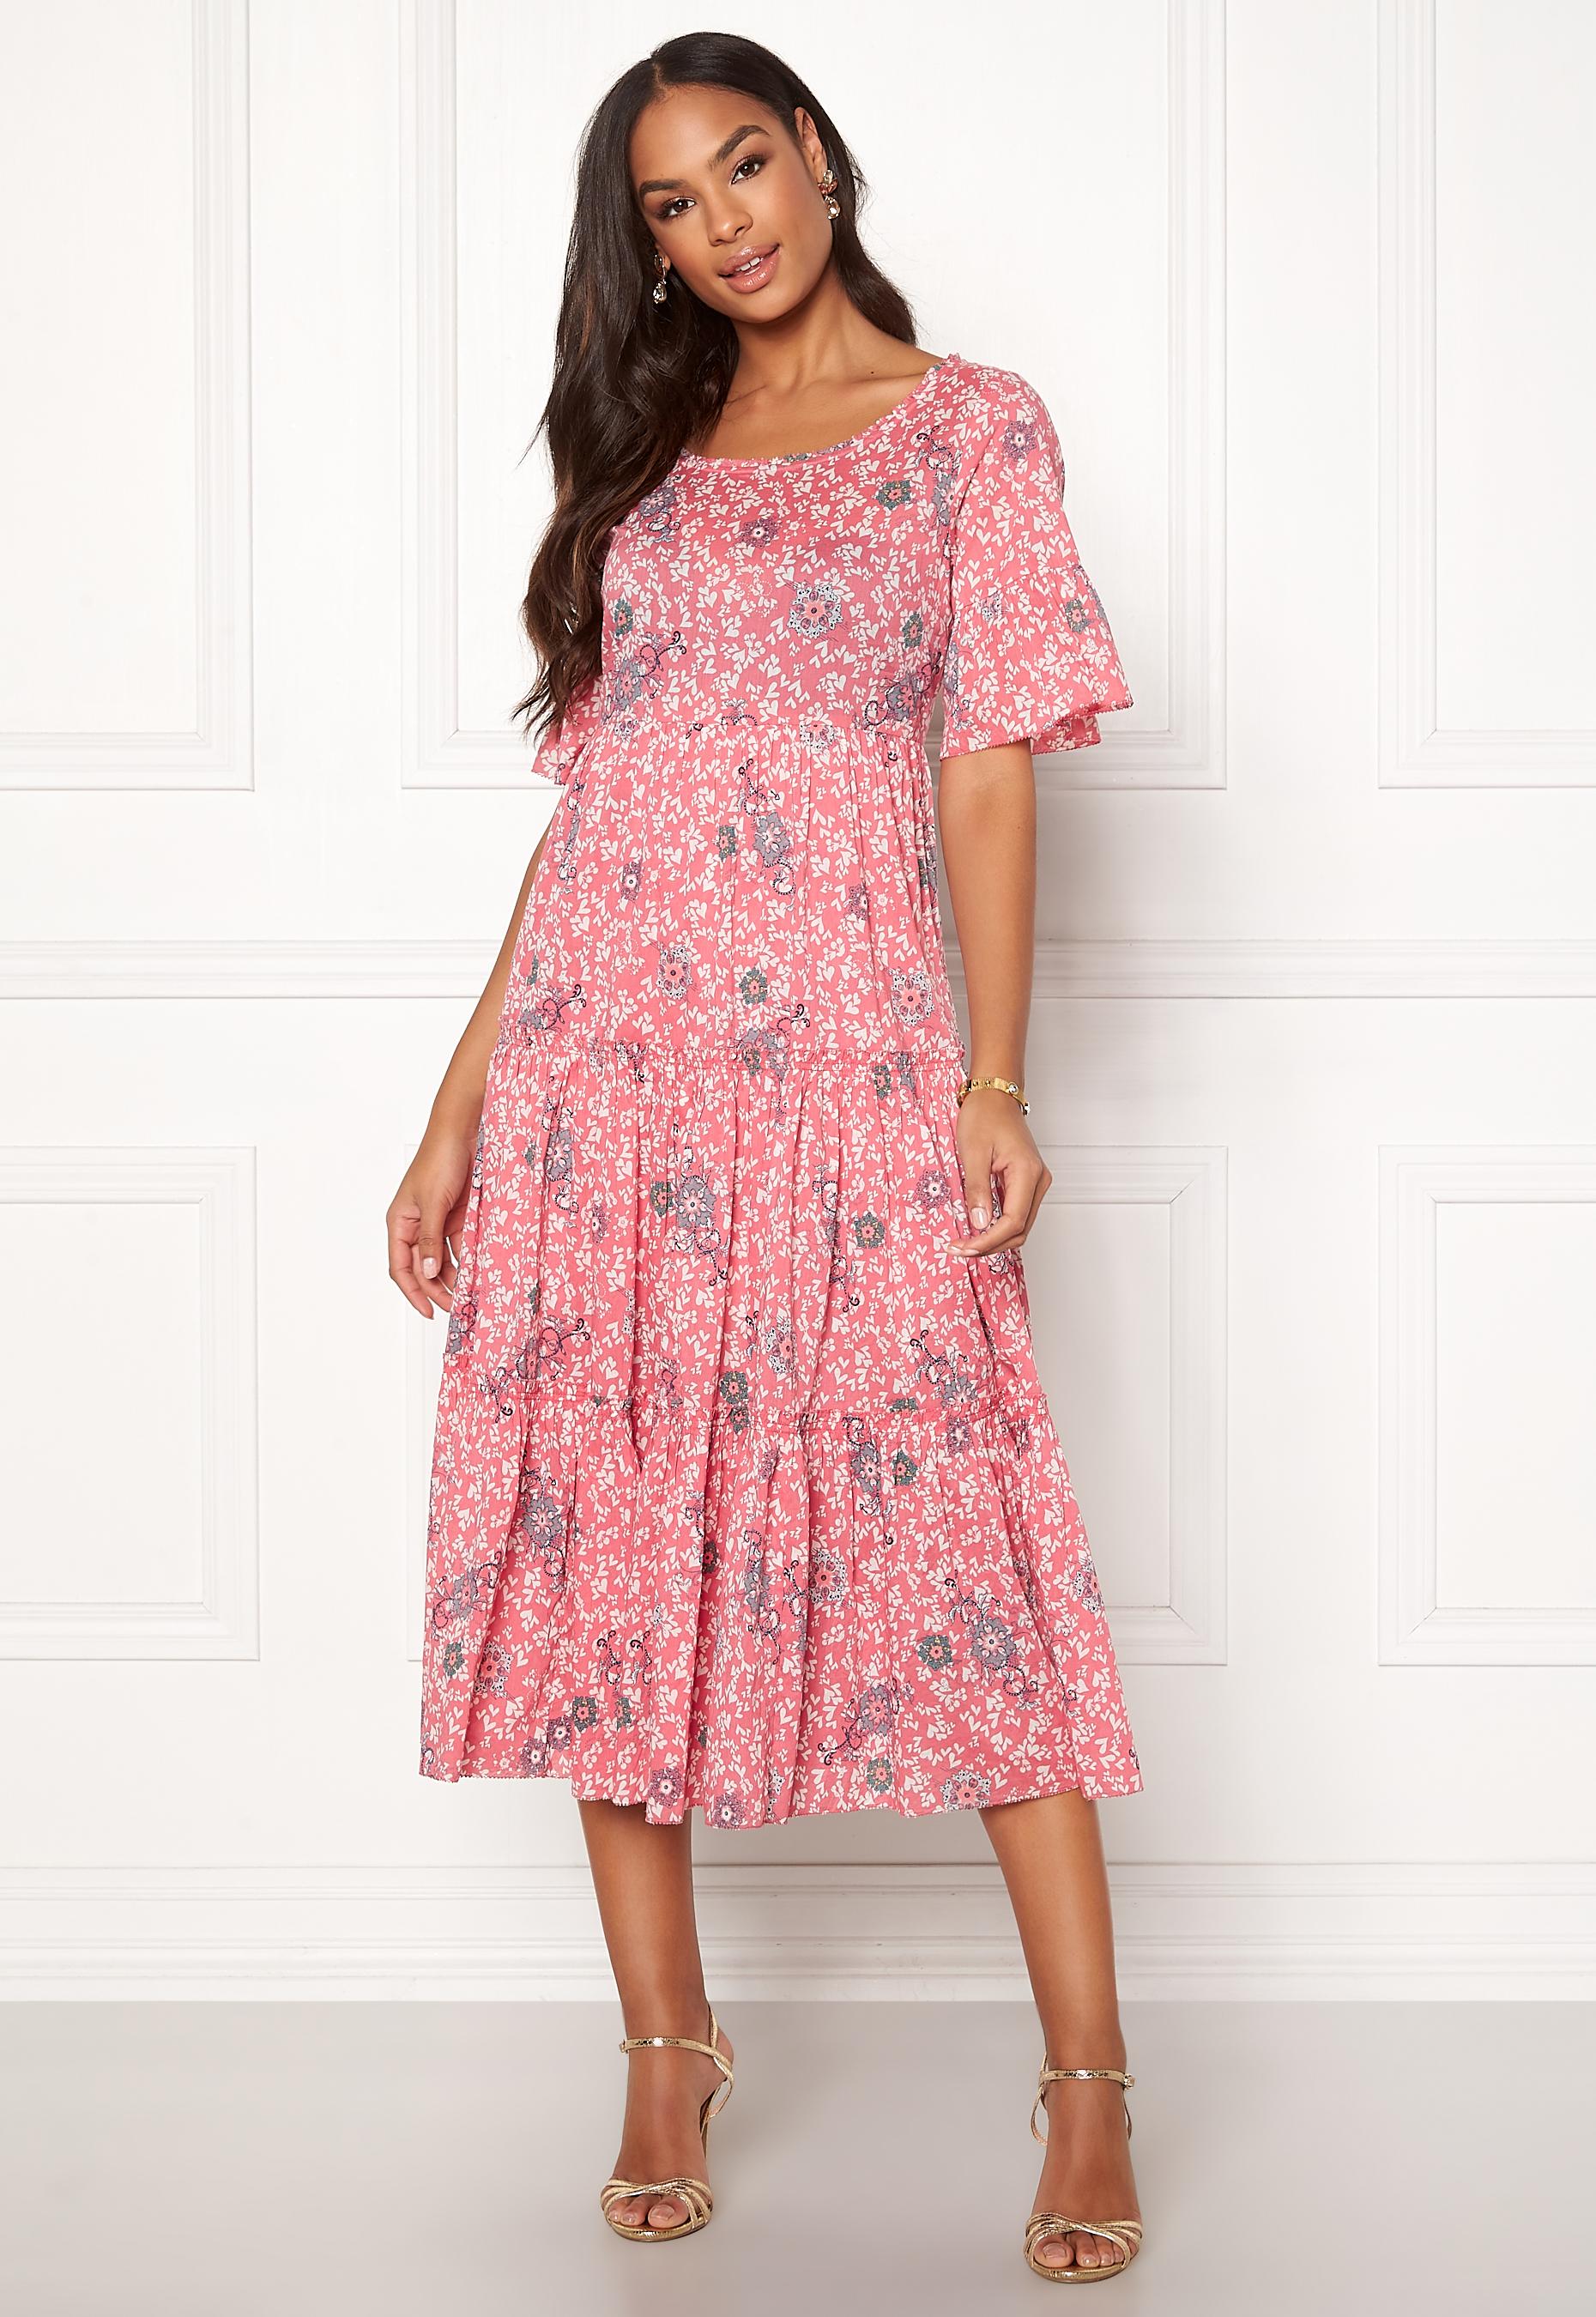 8d005729 Odd Molly Lush Shake Dress Blush Pink - Bubbleroom